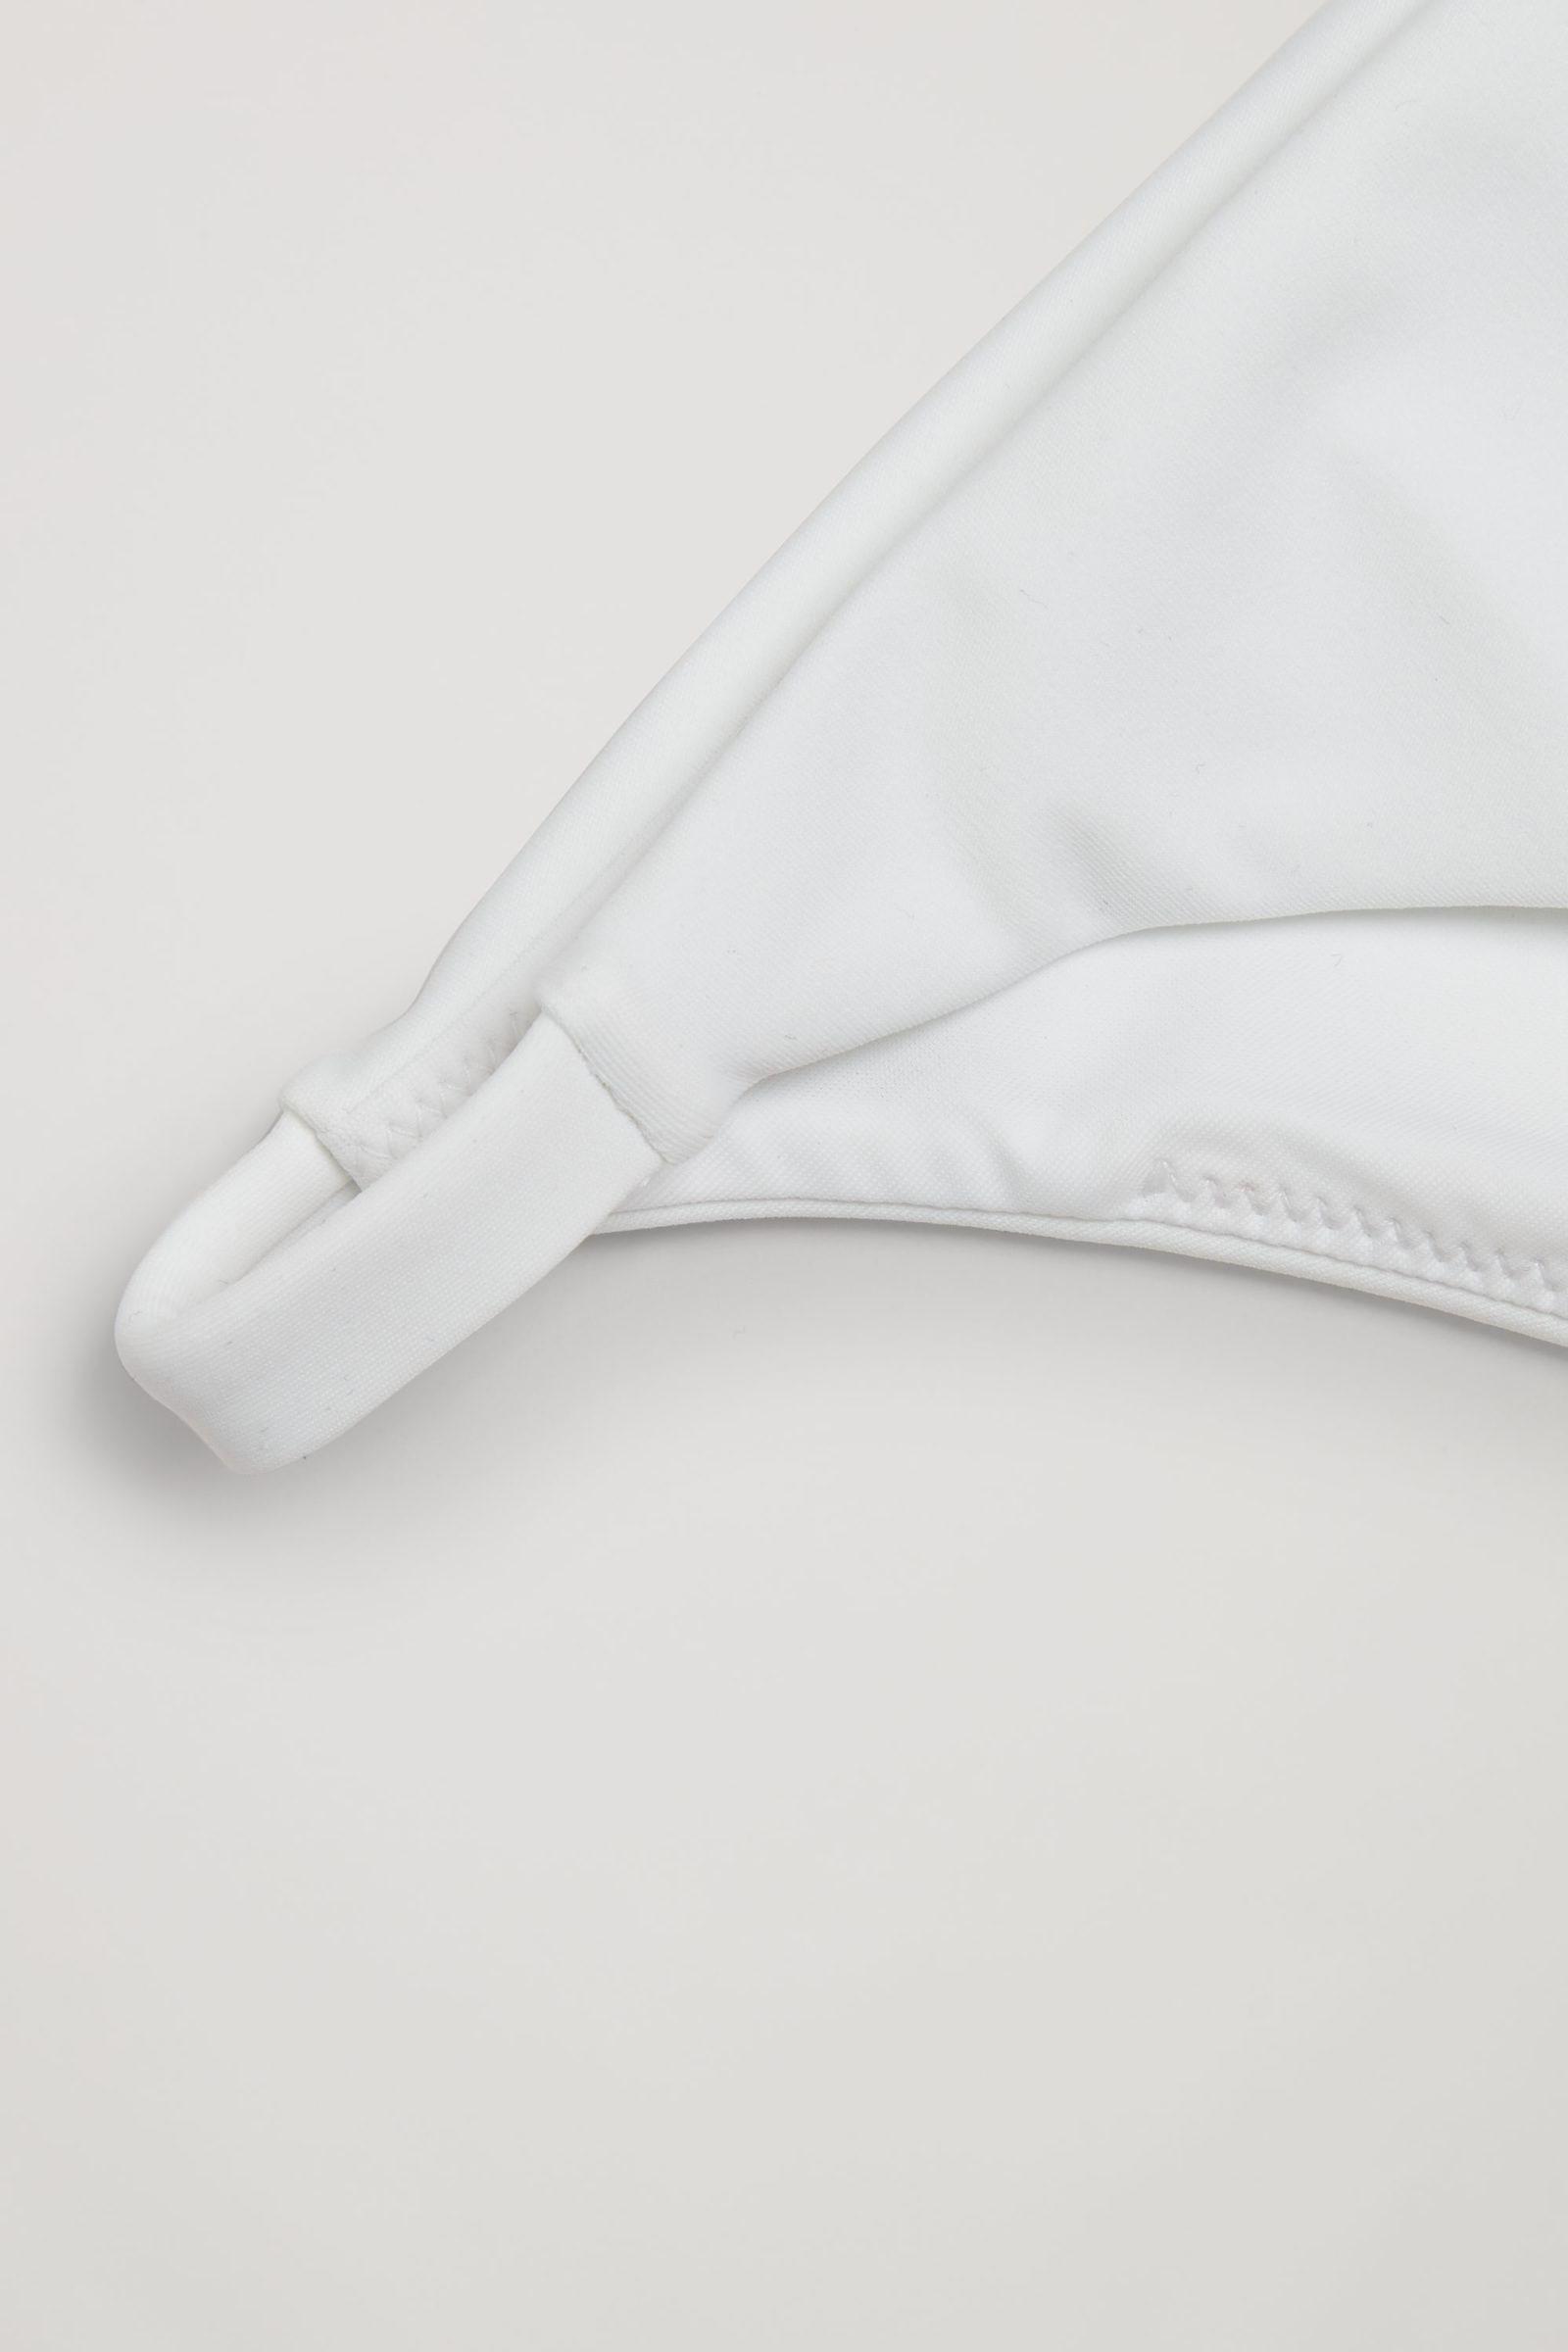 COS 플레인 사이드 스트랩 비키니 바텀의 화이트컬러 Detail입니다.